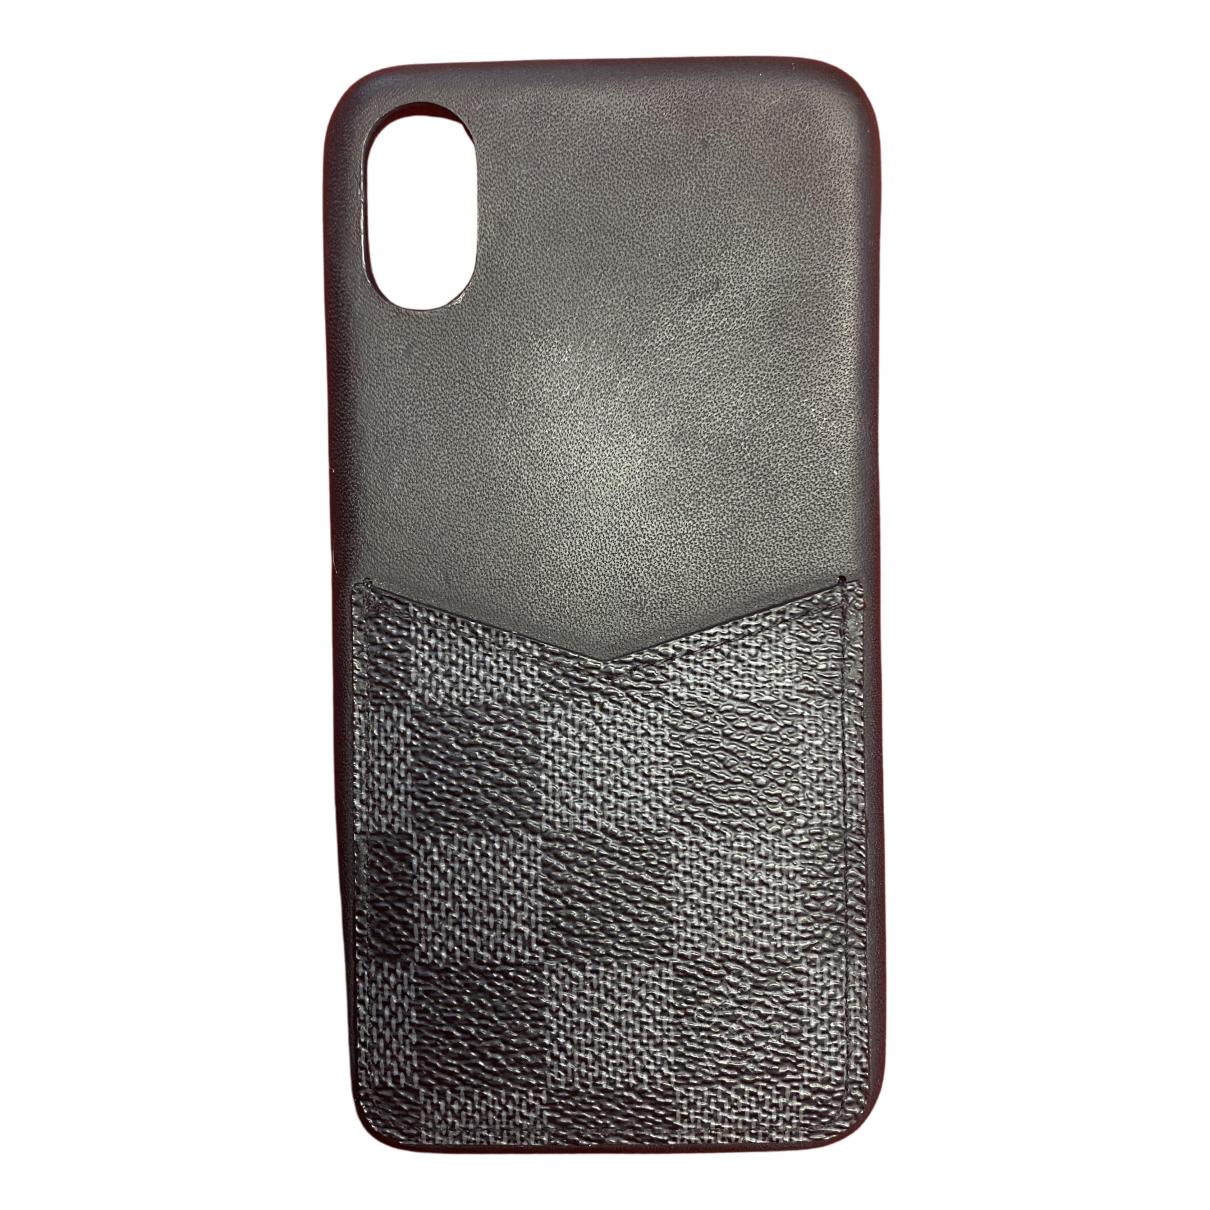 Funda iphone de Cuero Louis Vuitton